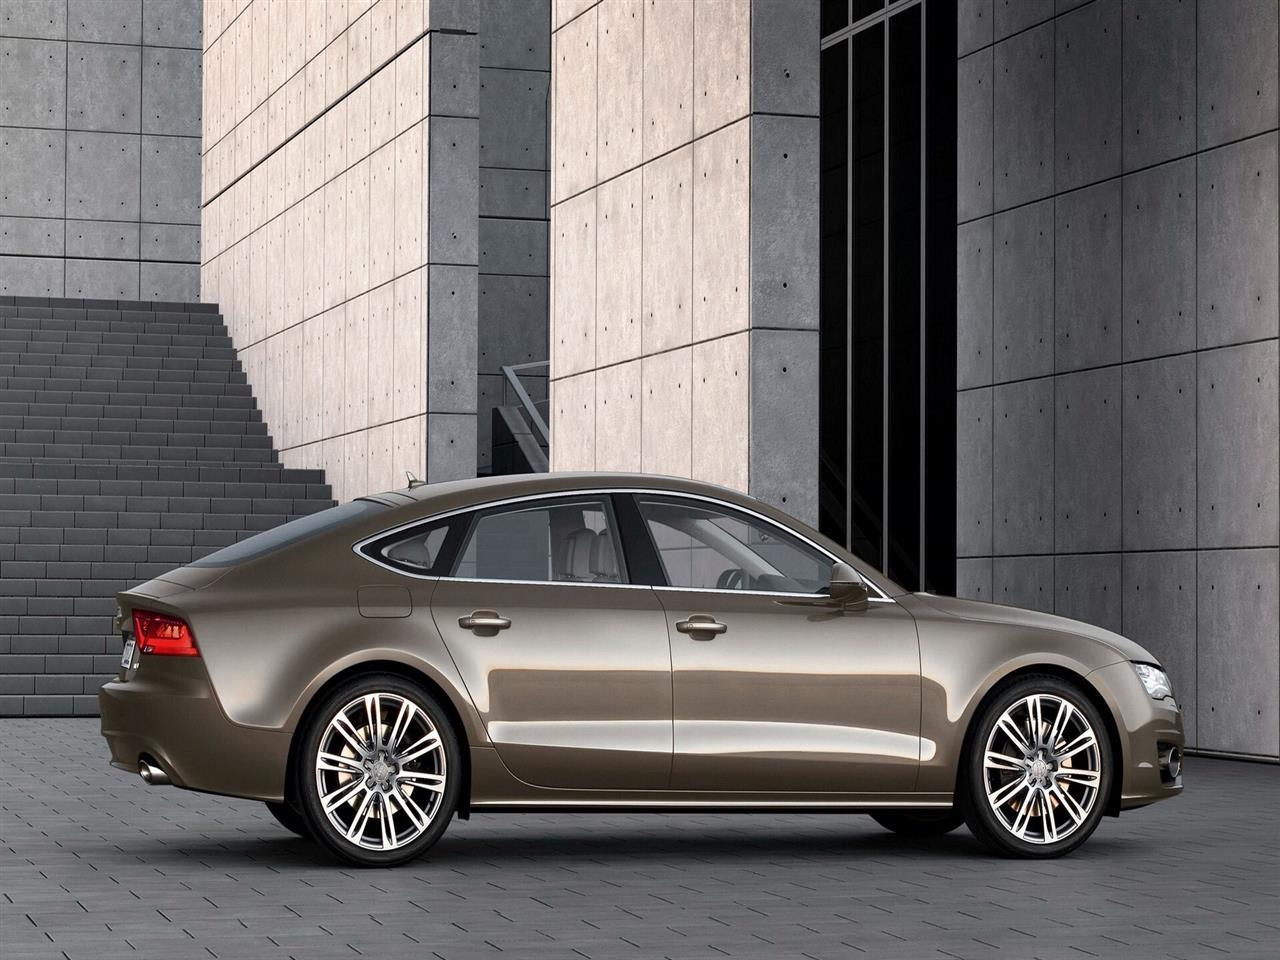 1280x960 Audi Car Photo